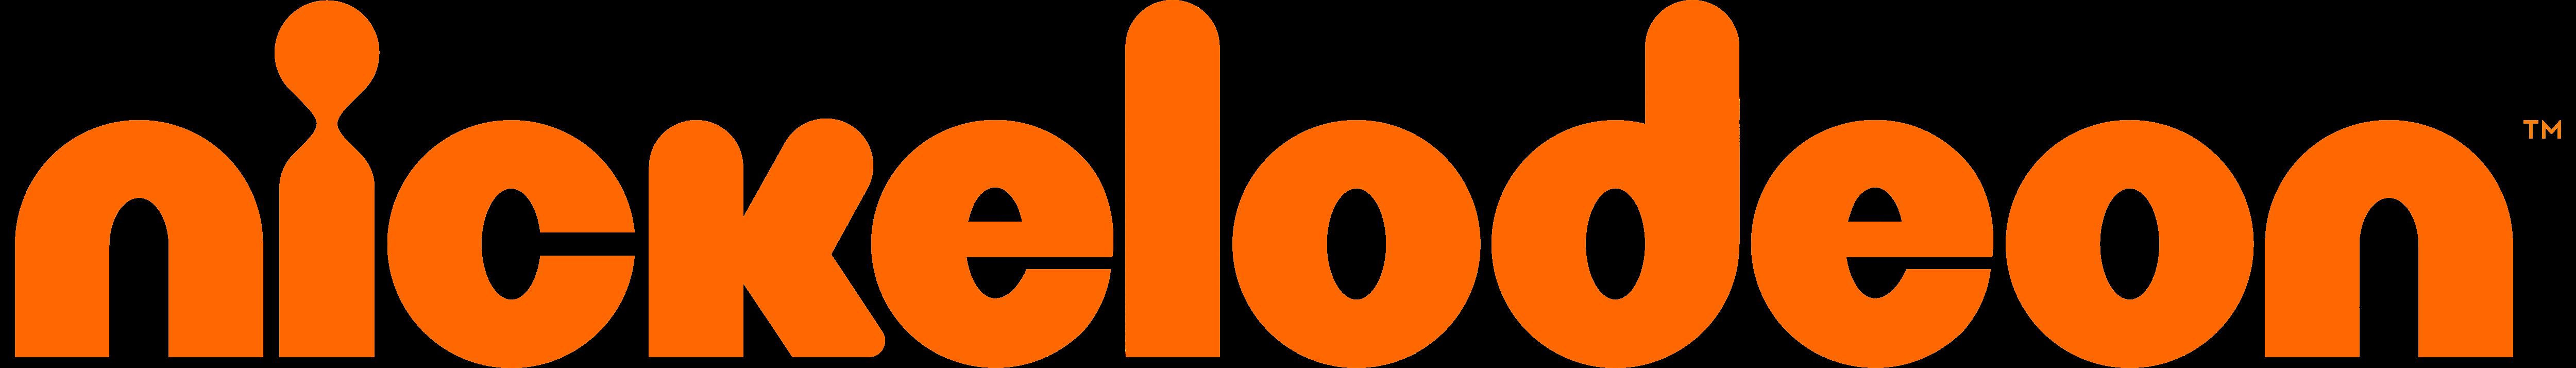 nickelodeon-schweiz-logo-png-14 Espn Letter Logo Template on bing letter templates, google letter templates, microsoft letter templates,